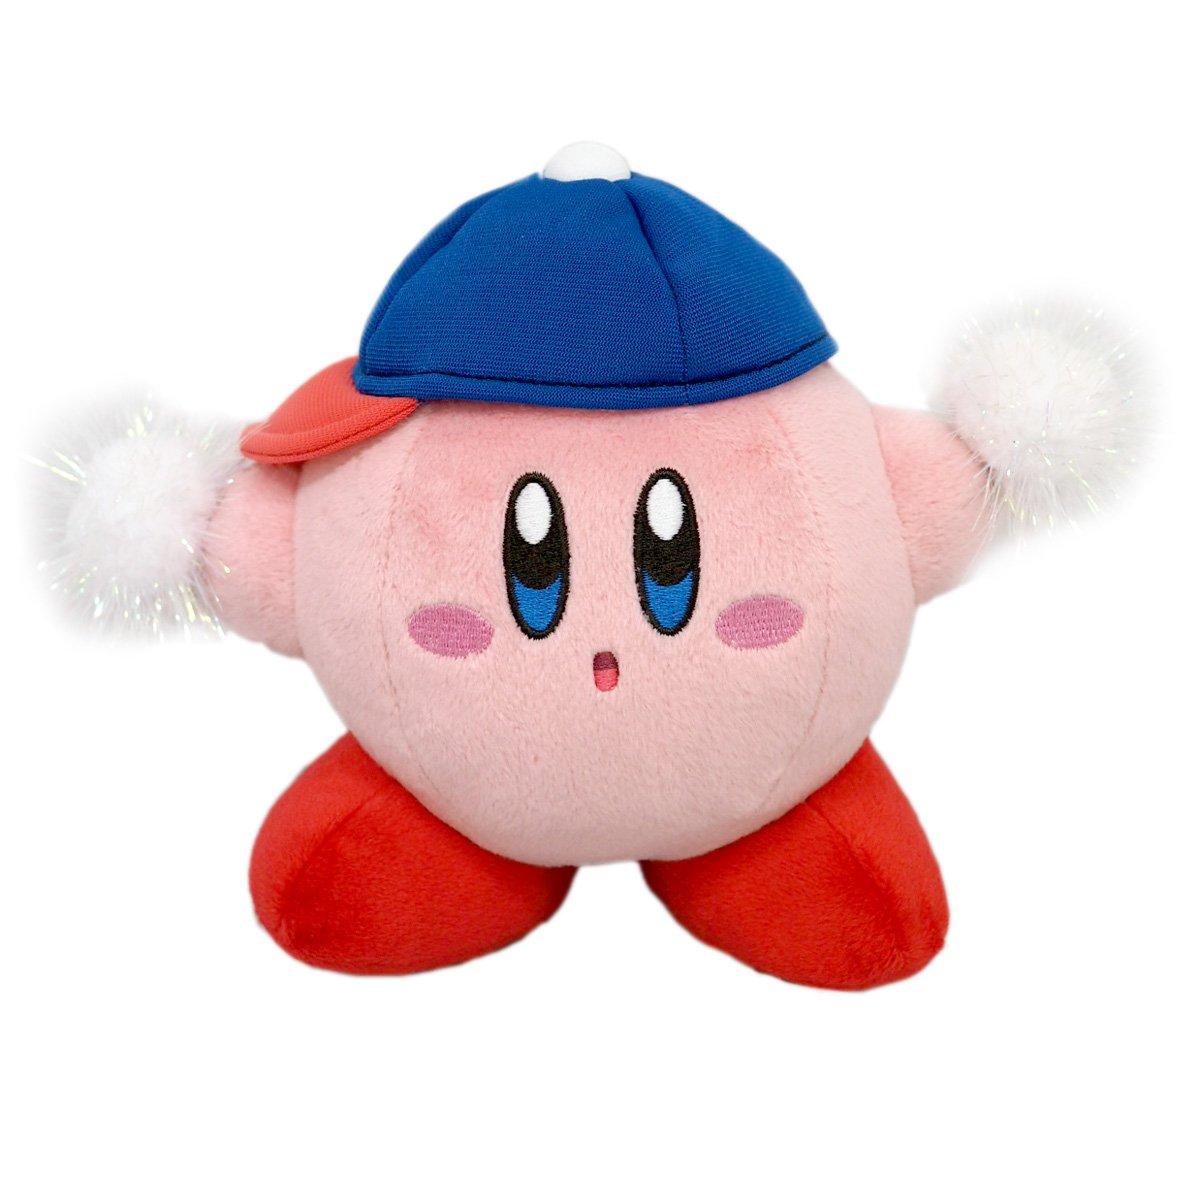 Amazon.com: Sanei Star Kirby Plush Toy Doll KP25 Esper Kirby ...